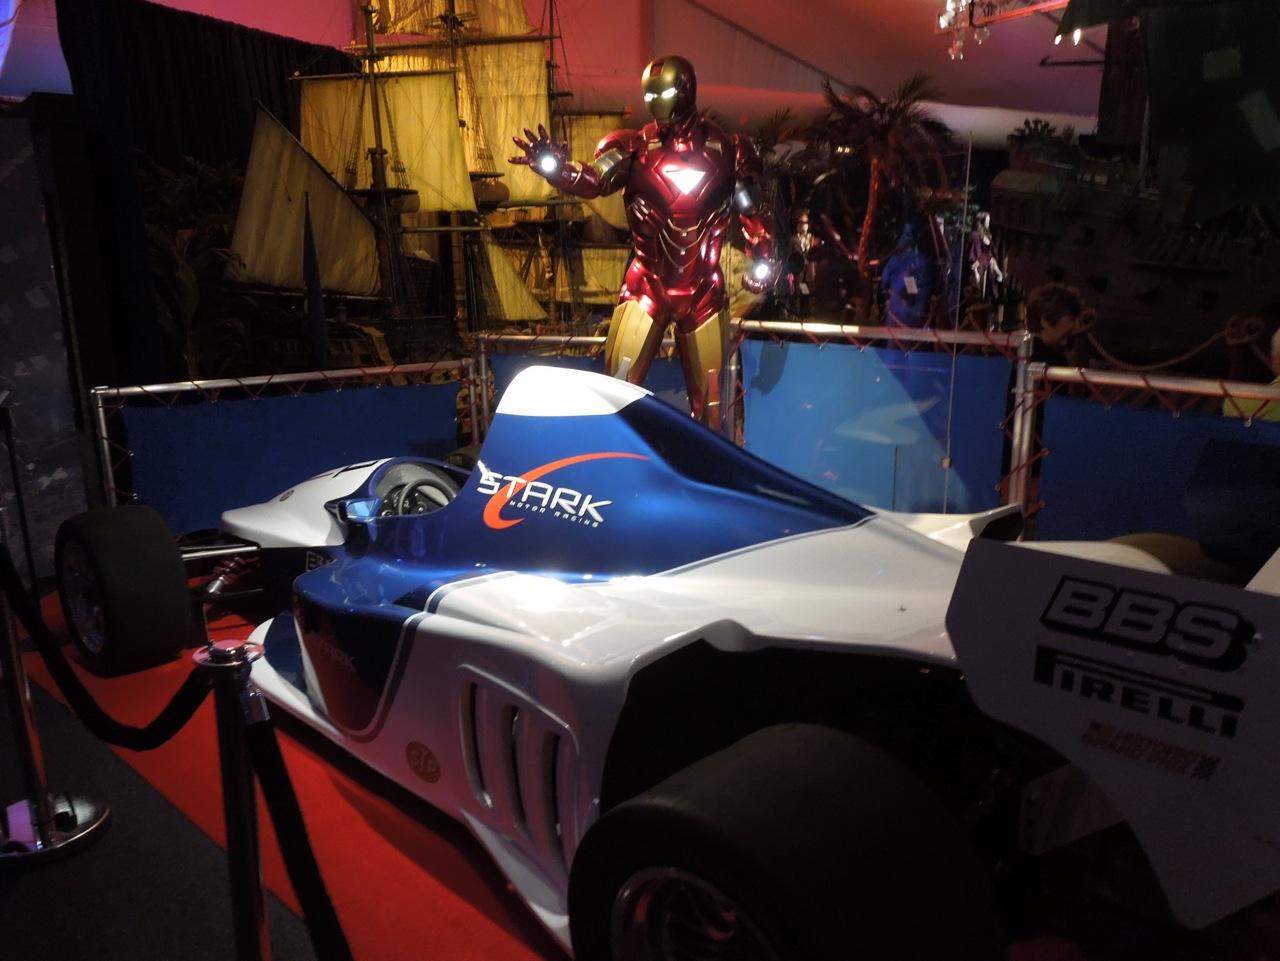 Iron Man 2: Hollywood Movie Costumes And Props: Tony Stark's F1 Race